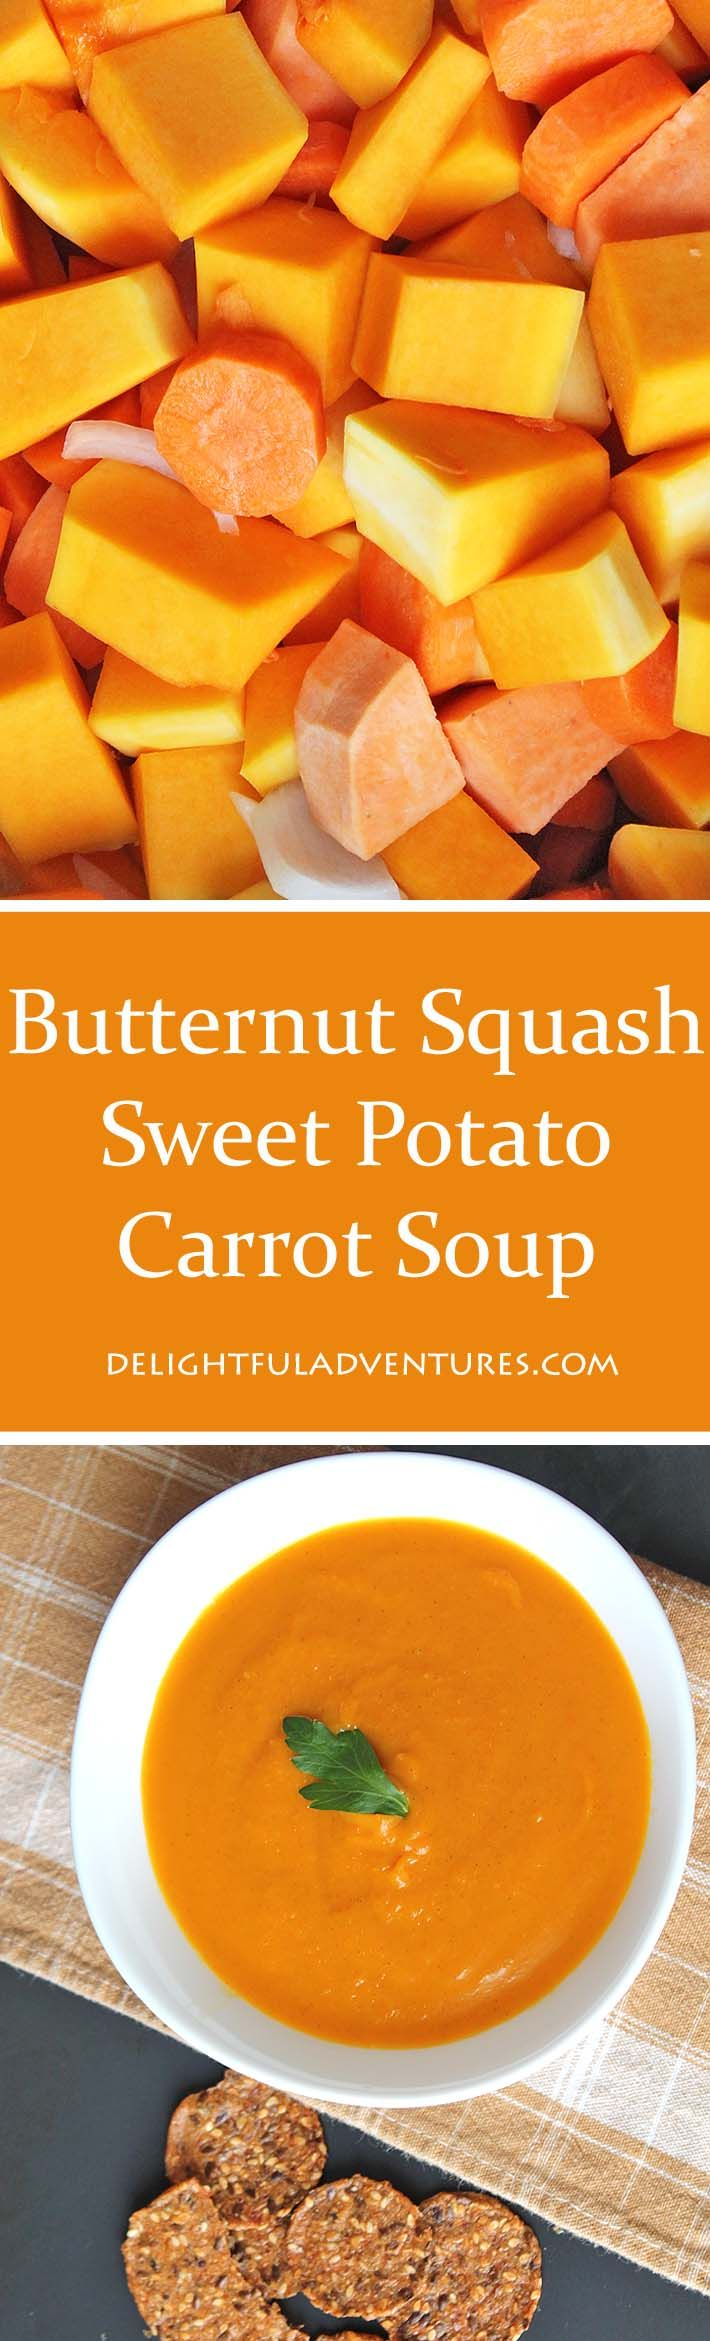 A simple, easy recipe for slow cooker vegan butternut squash sweet potato carrot…